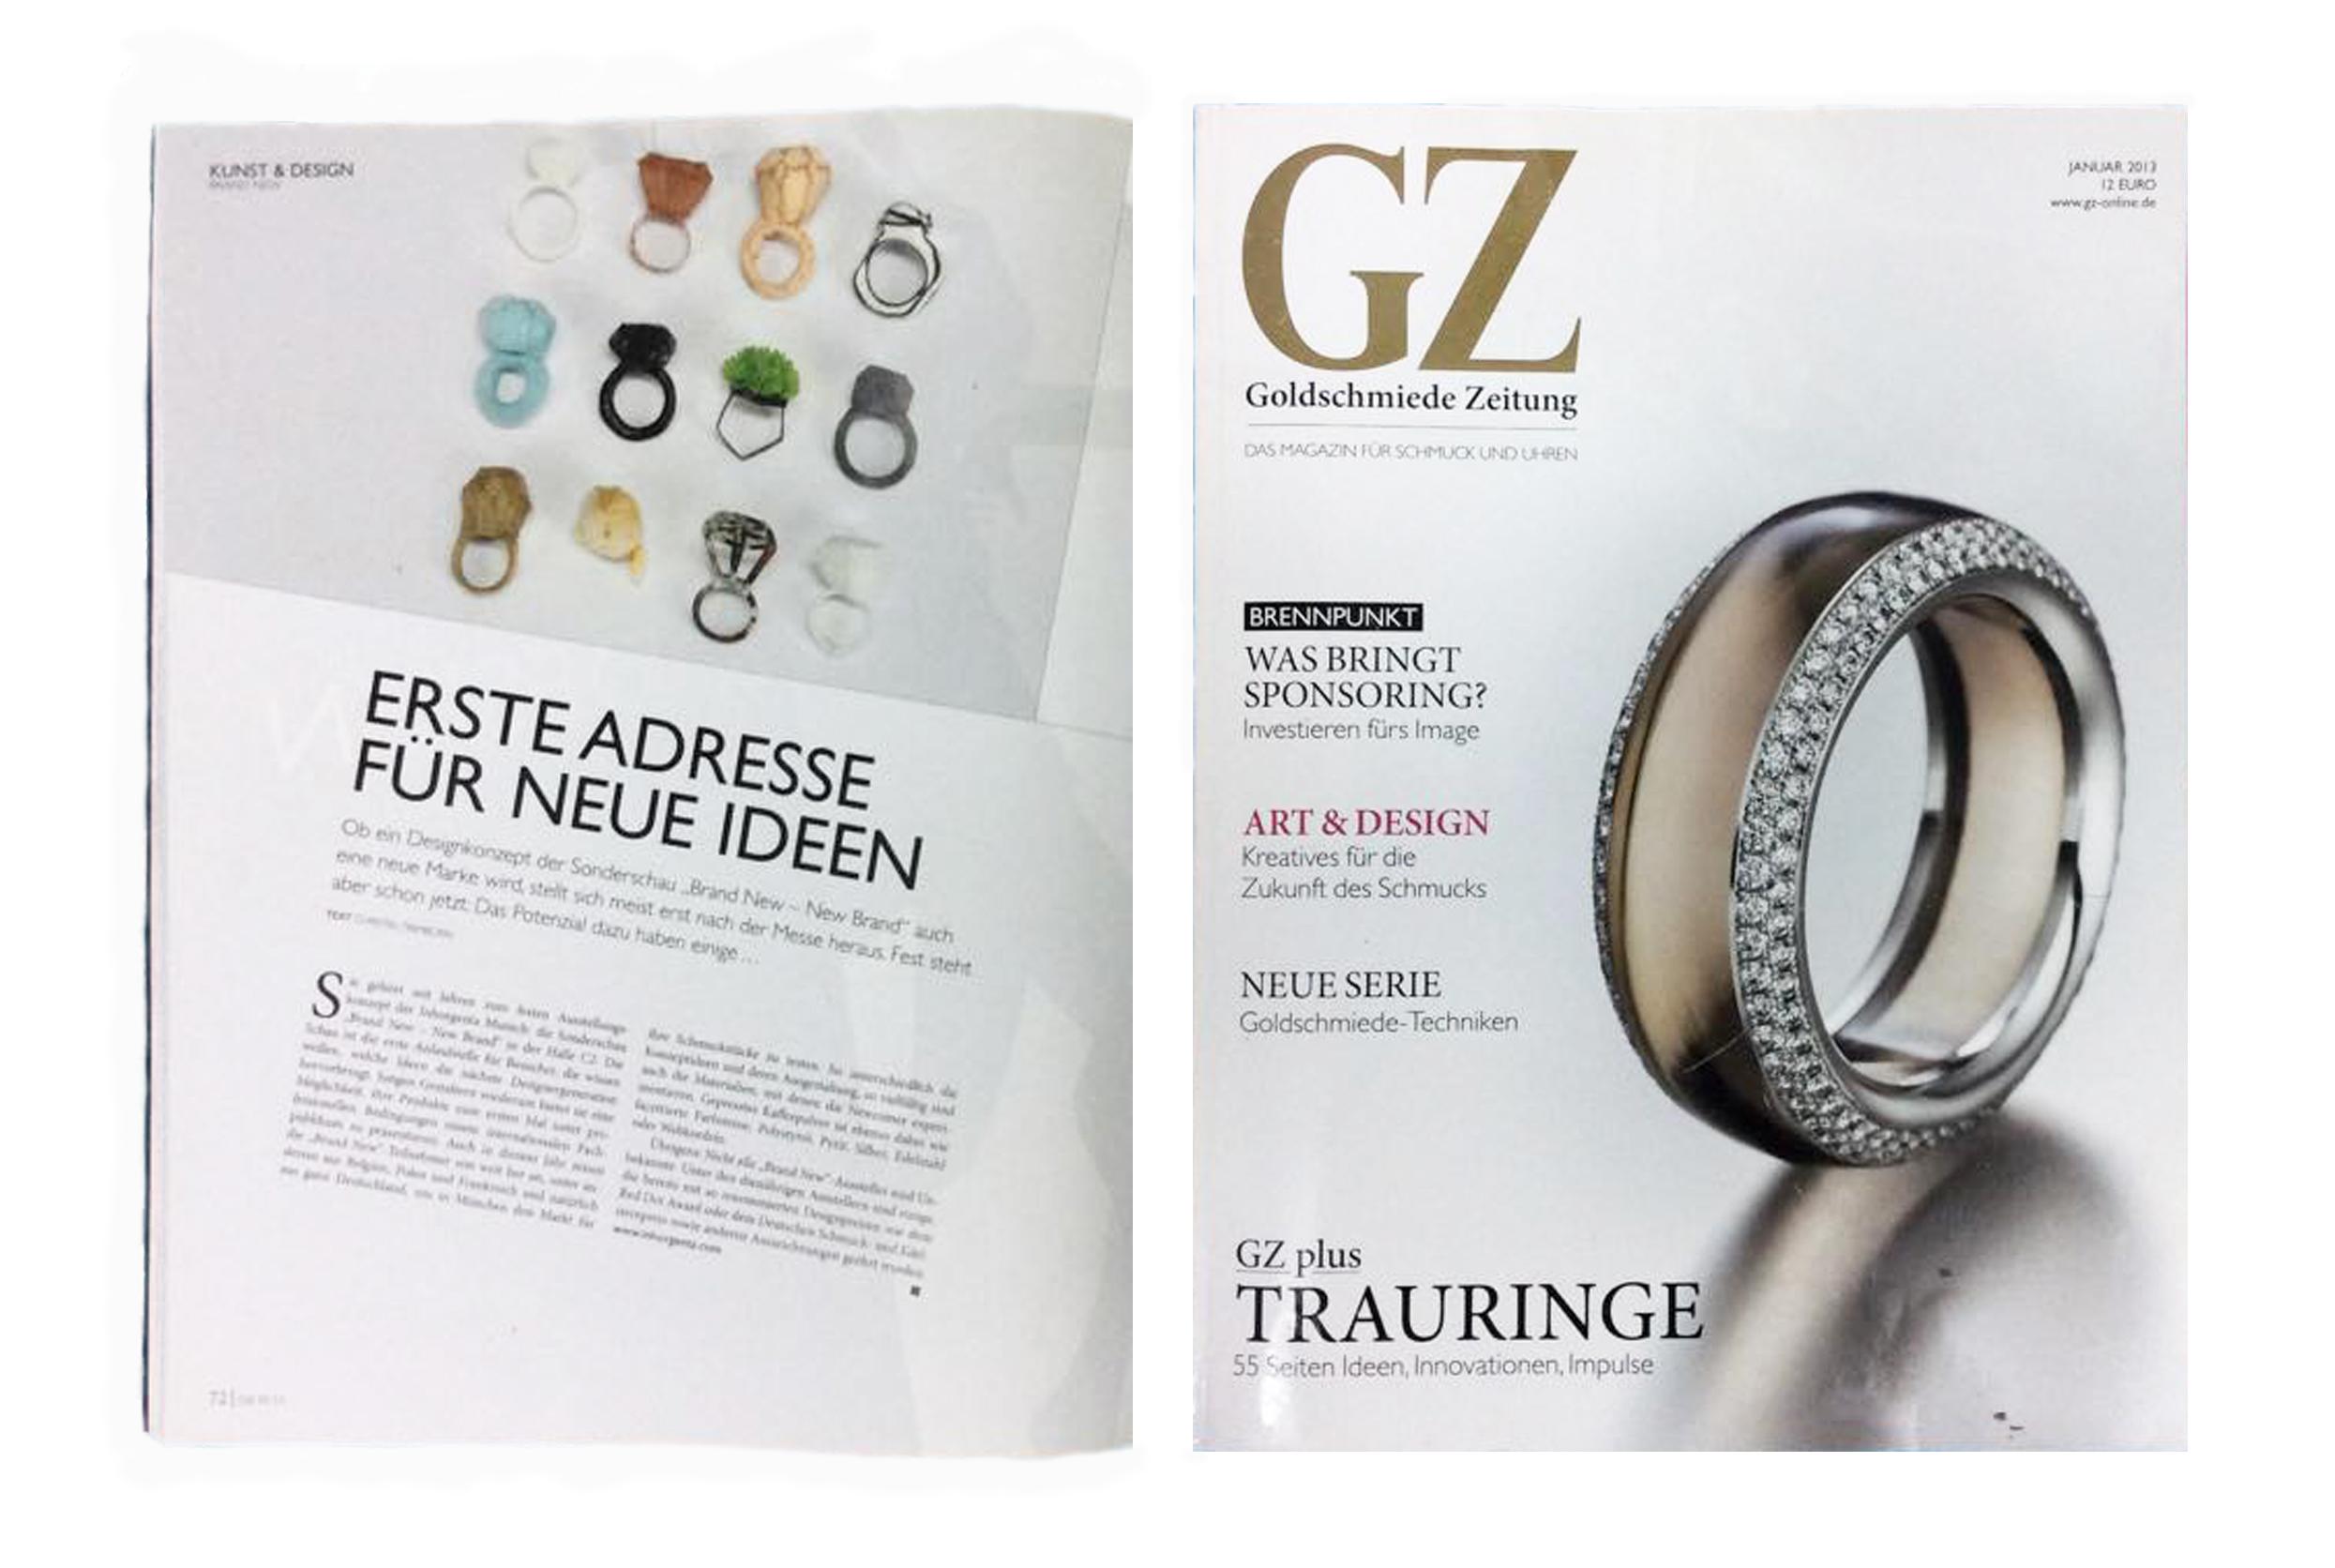 Goldschmiede Zeitung - Goldschmiede Zeitung MunichJanuary 2013